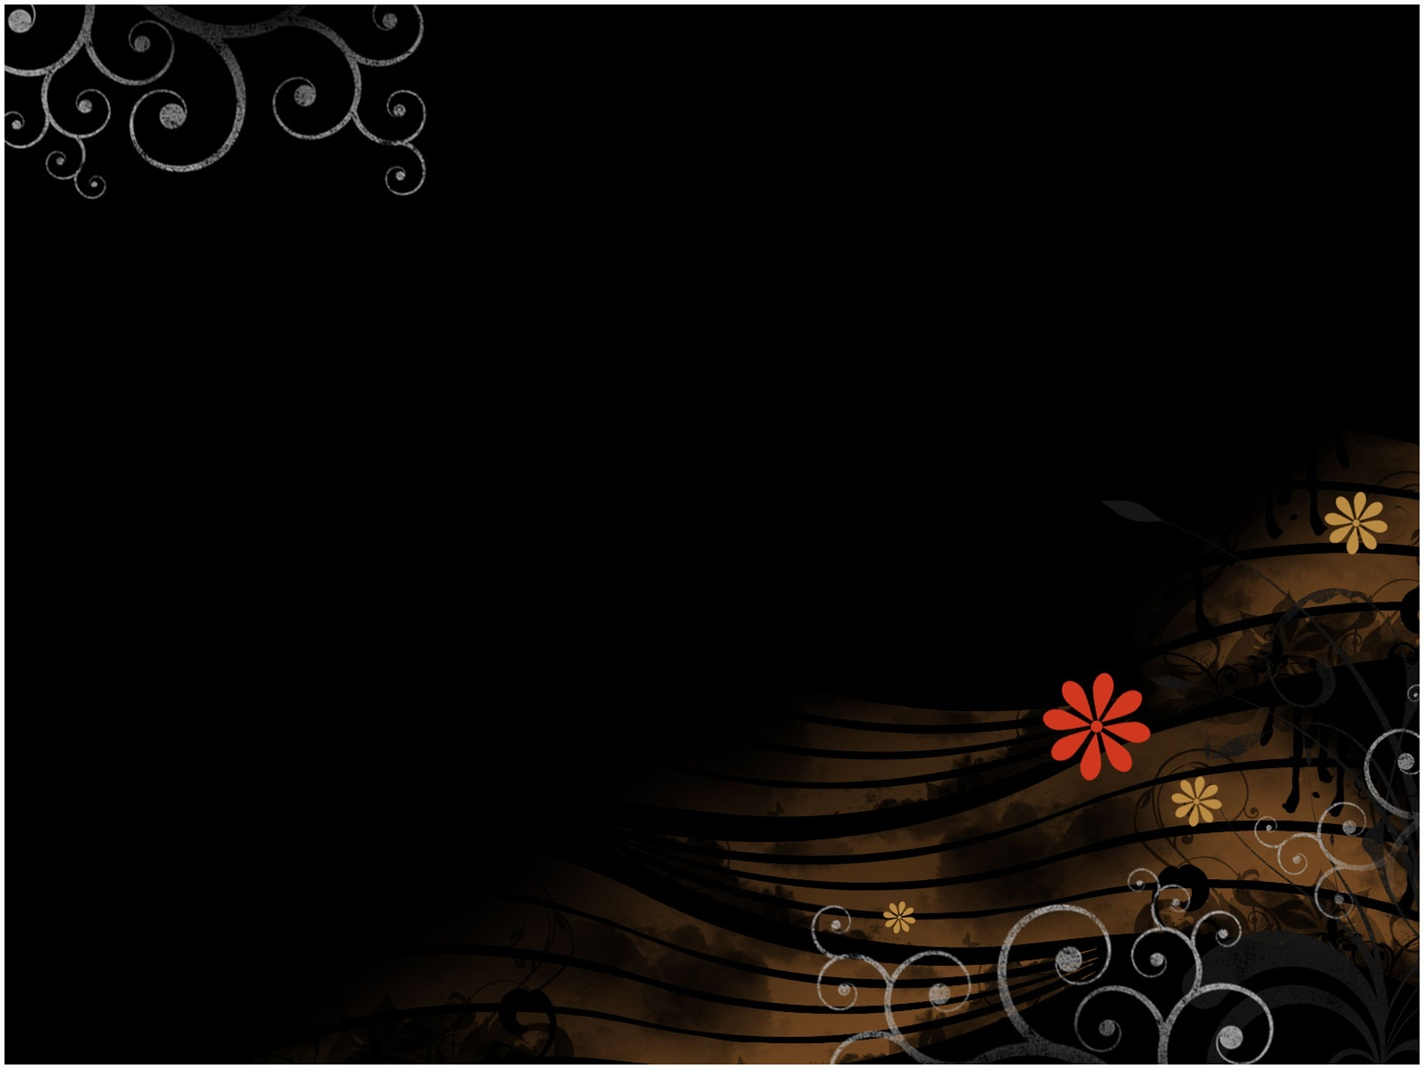 Desktop Animated Wallpaper for Macjpg 1424x1068